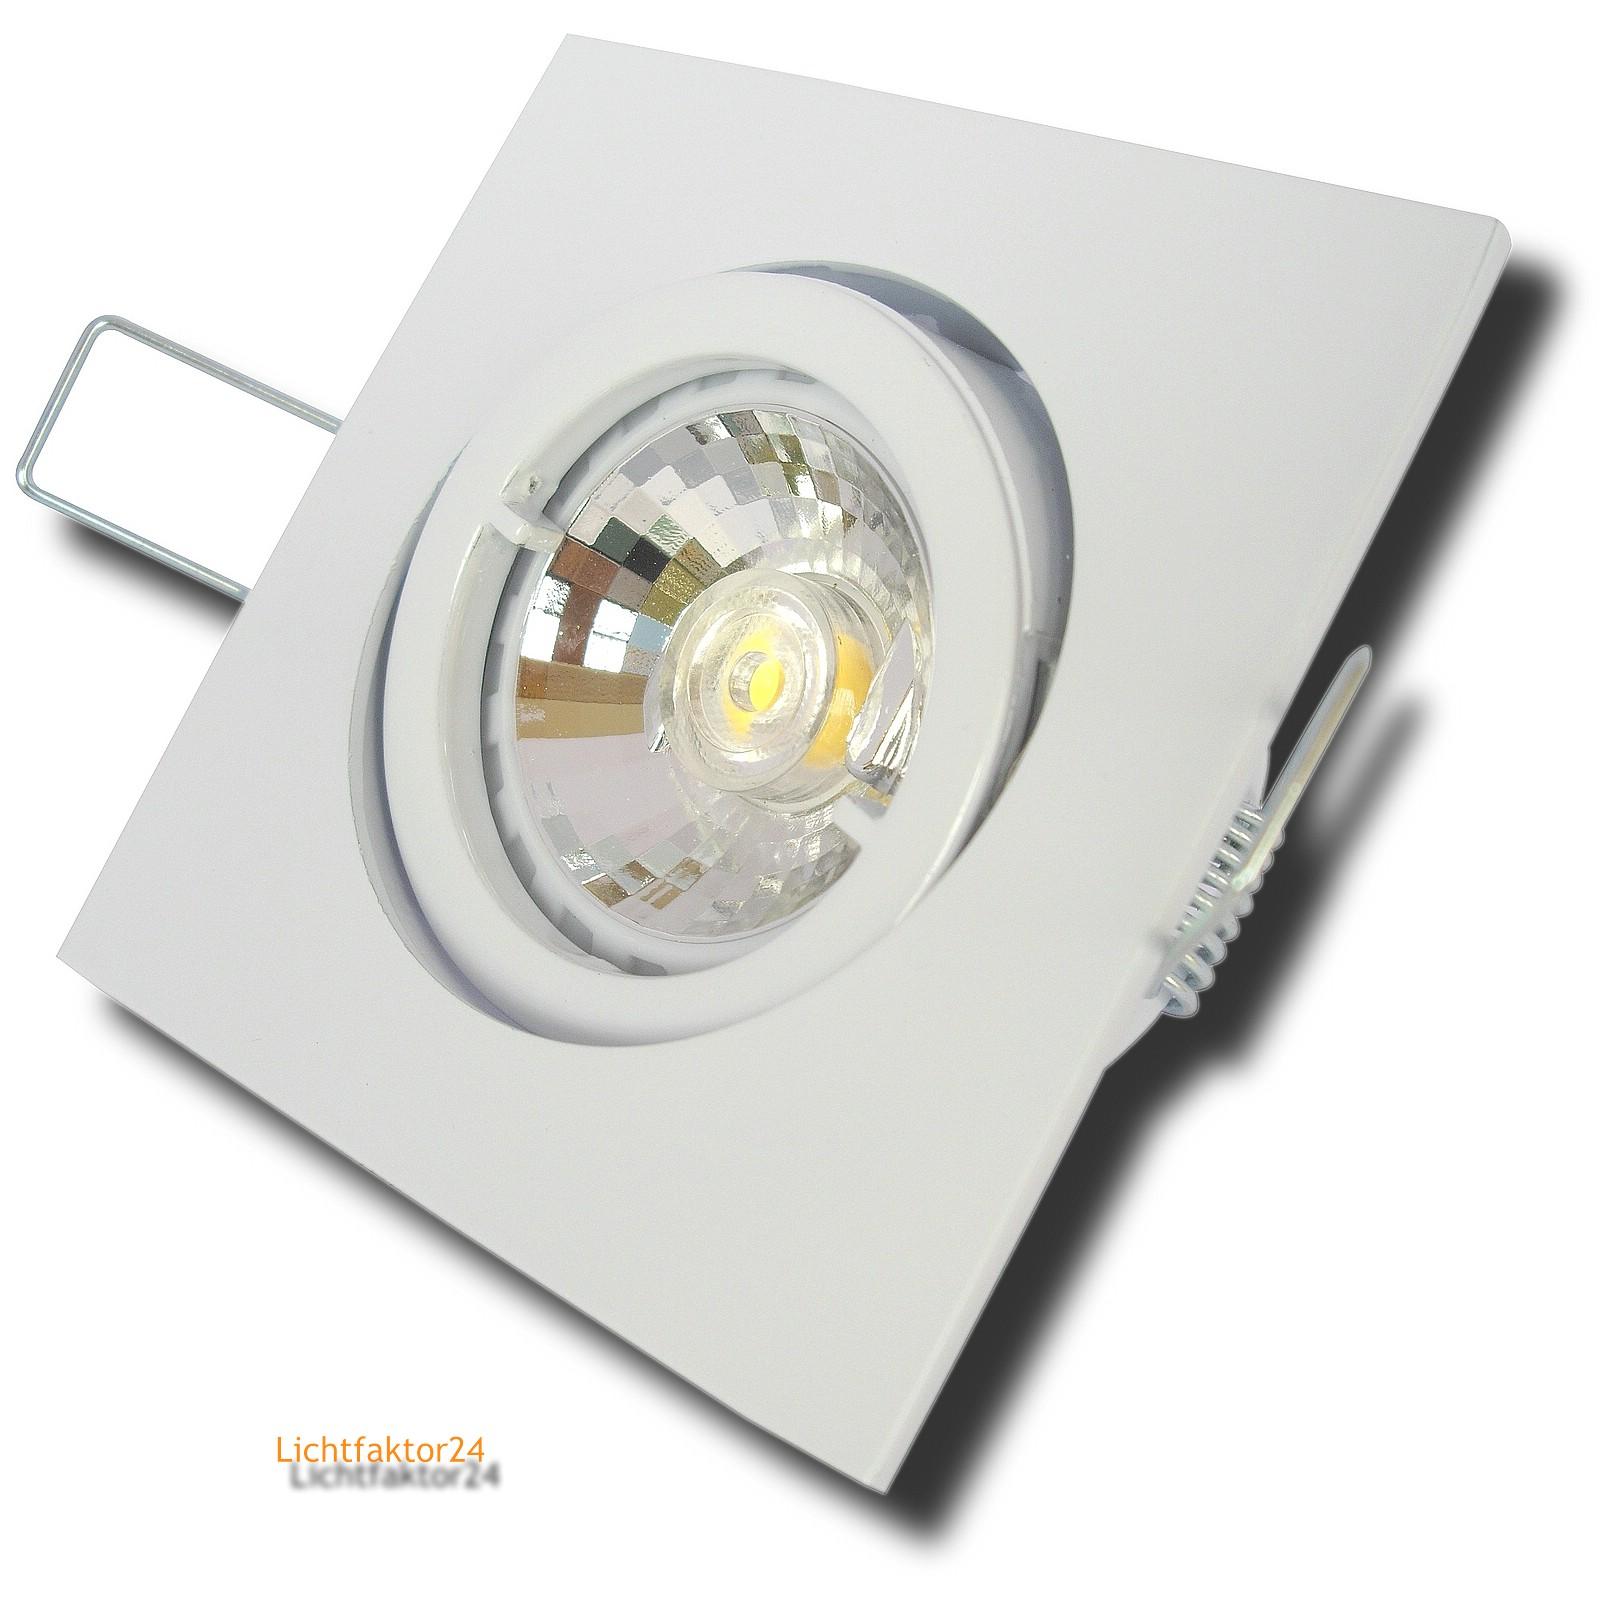 einbauleuchte dario 230v mcob led 7watt dimmbar aluminium gu10 schwenkbar. Black Bedroom Furniture Sets. Home Design Ideas